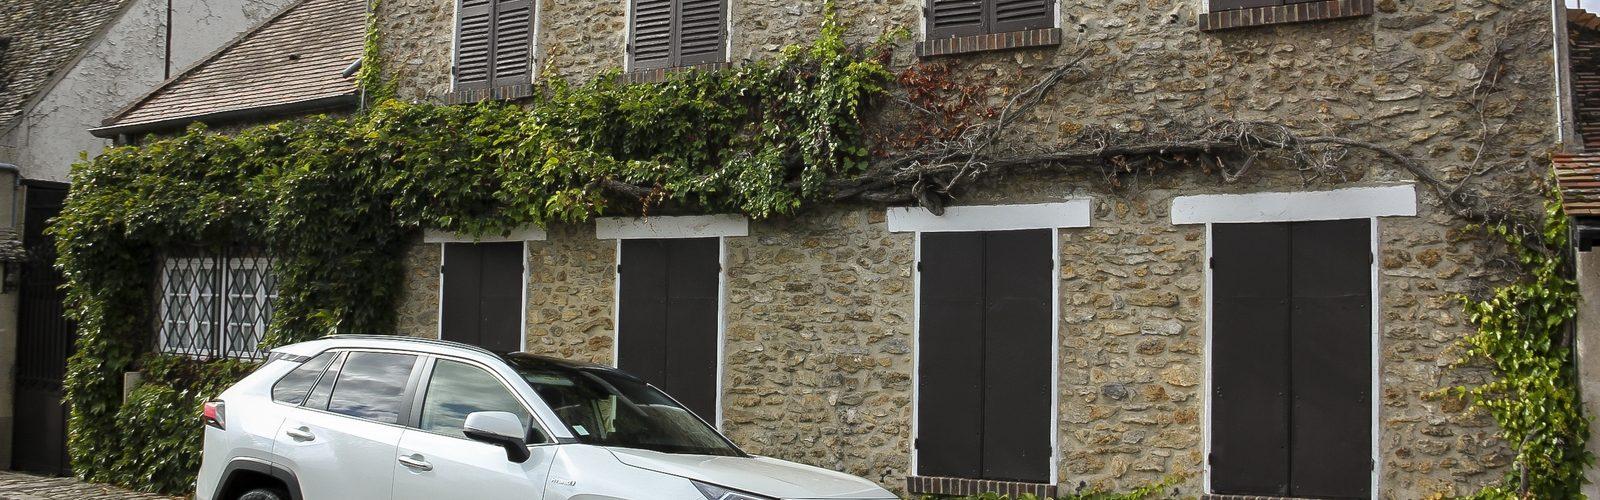 Essai Toyota Rav4 2WD i Lounge